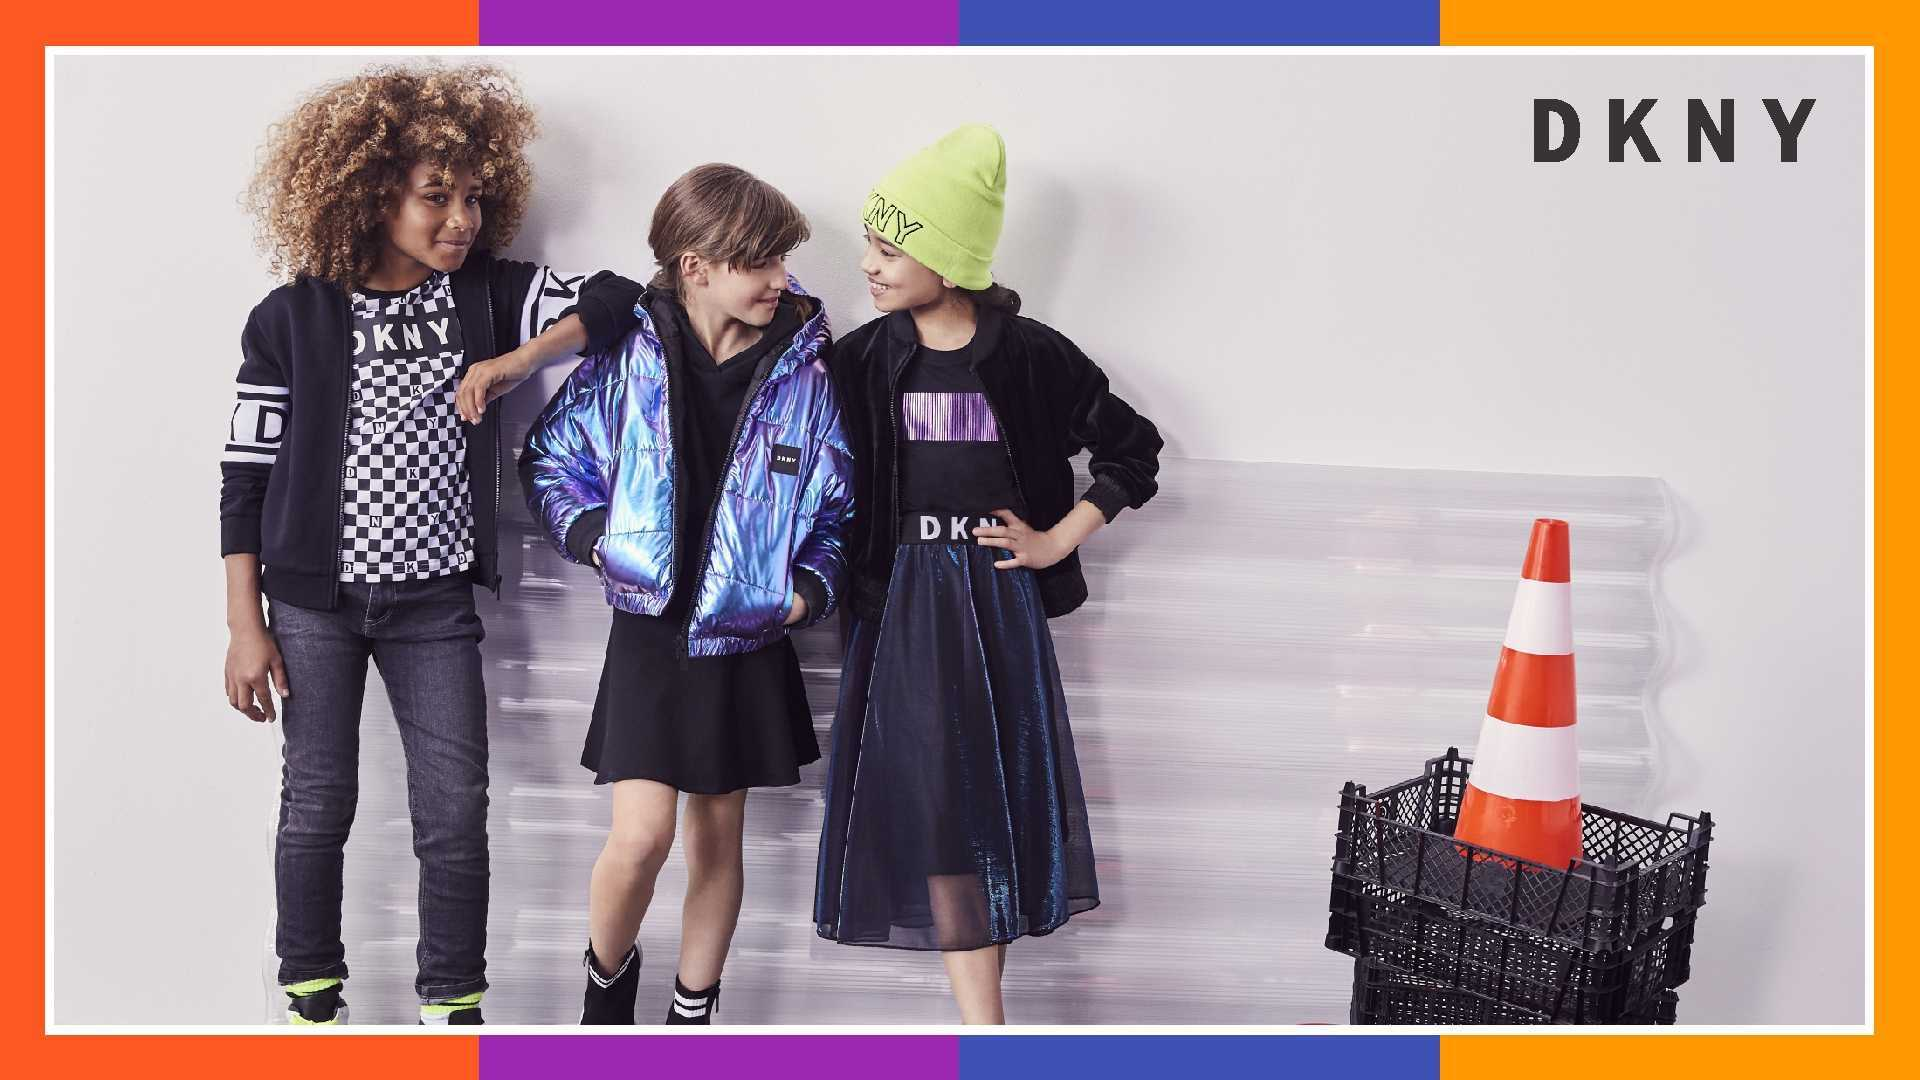 Dimpy's Corner - Blog Images DKNY 1